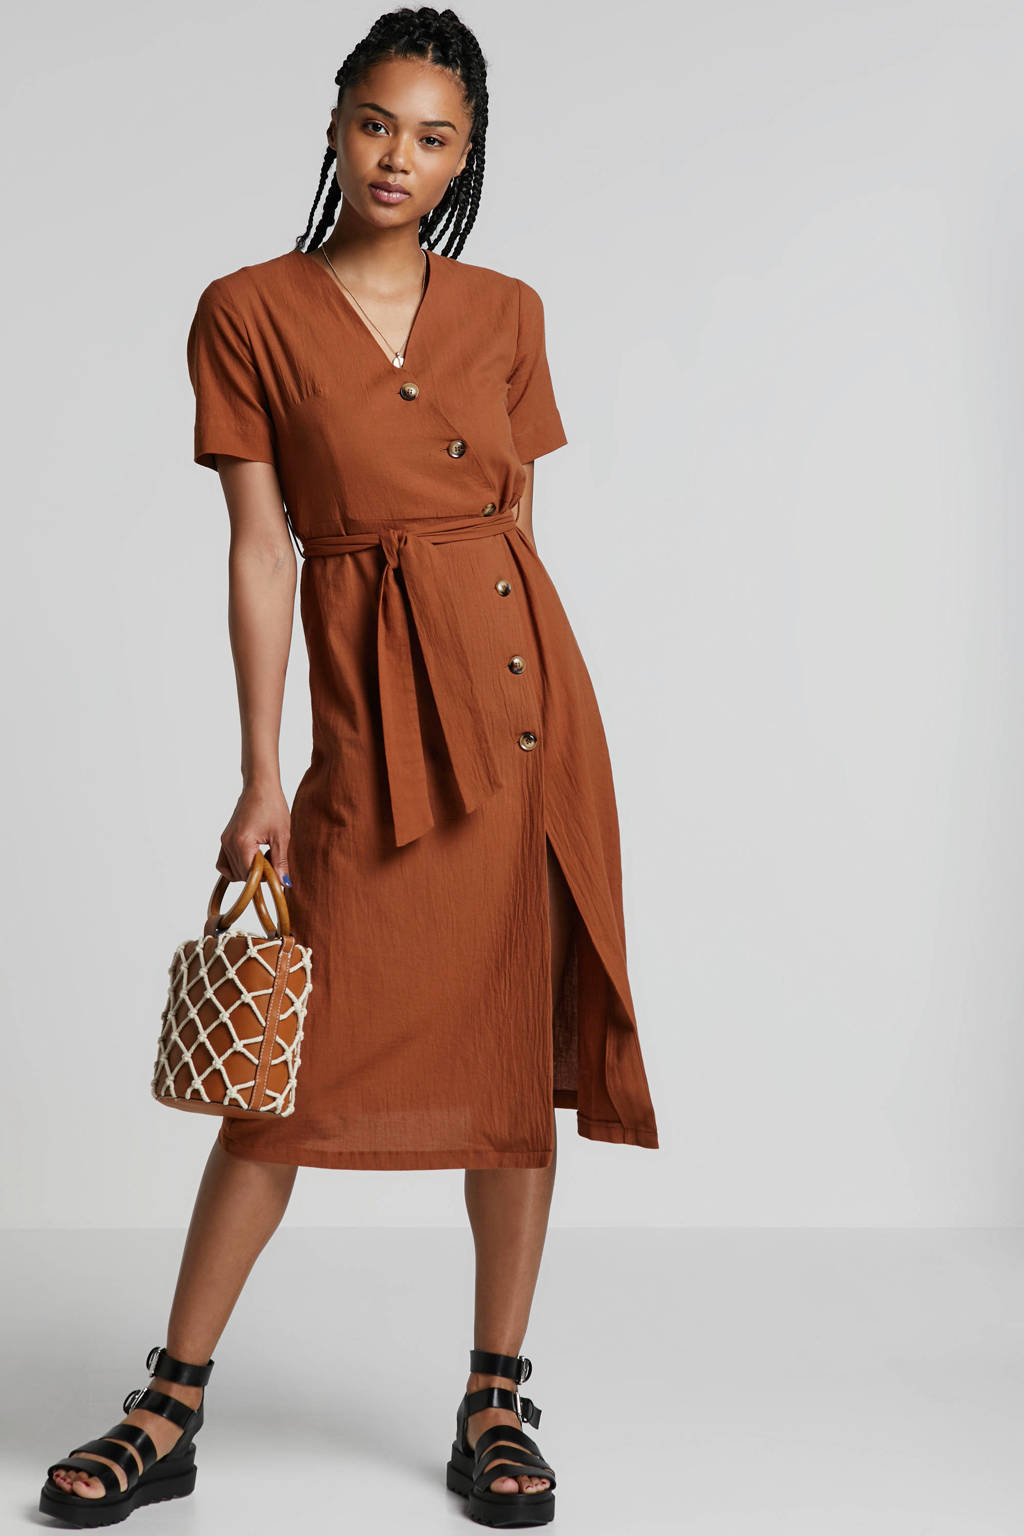 ONLY jurk met ceintuur, Cognac